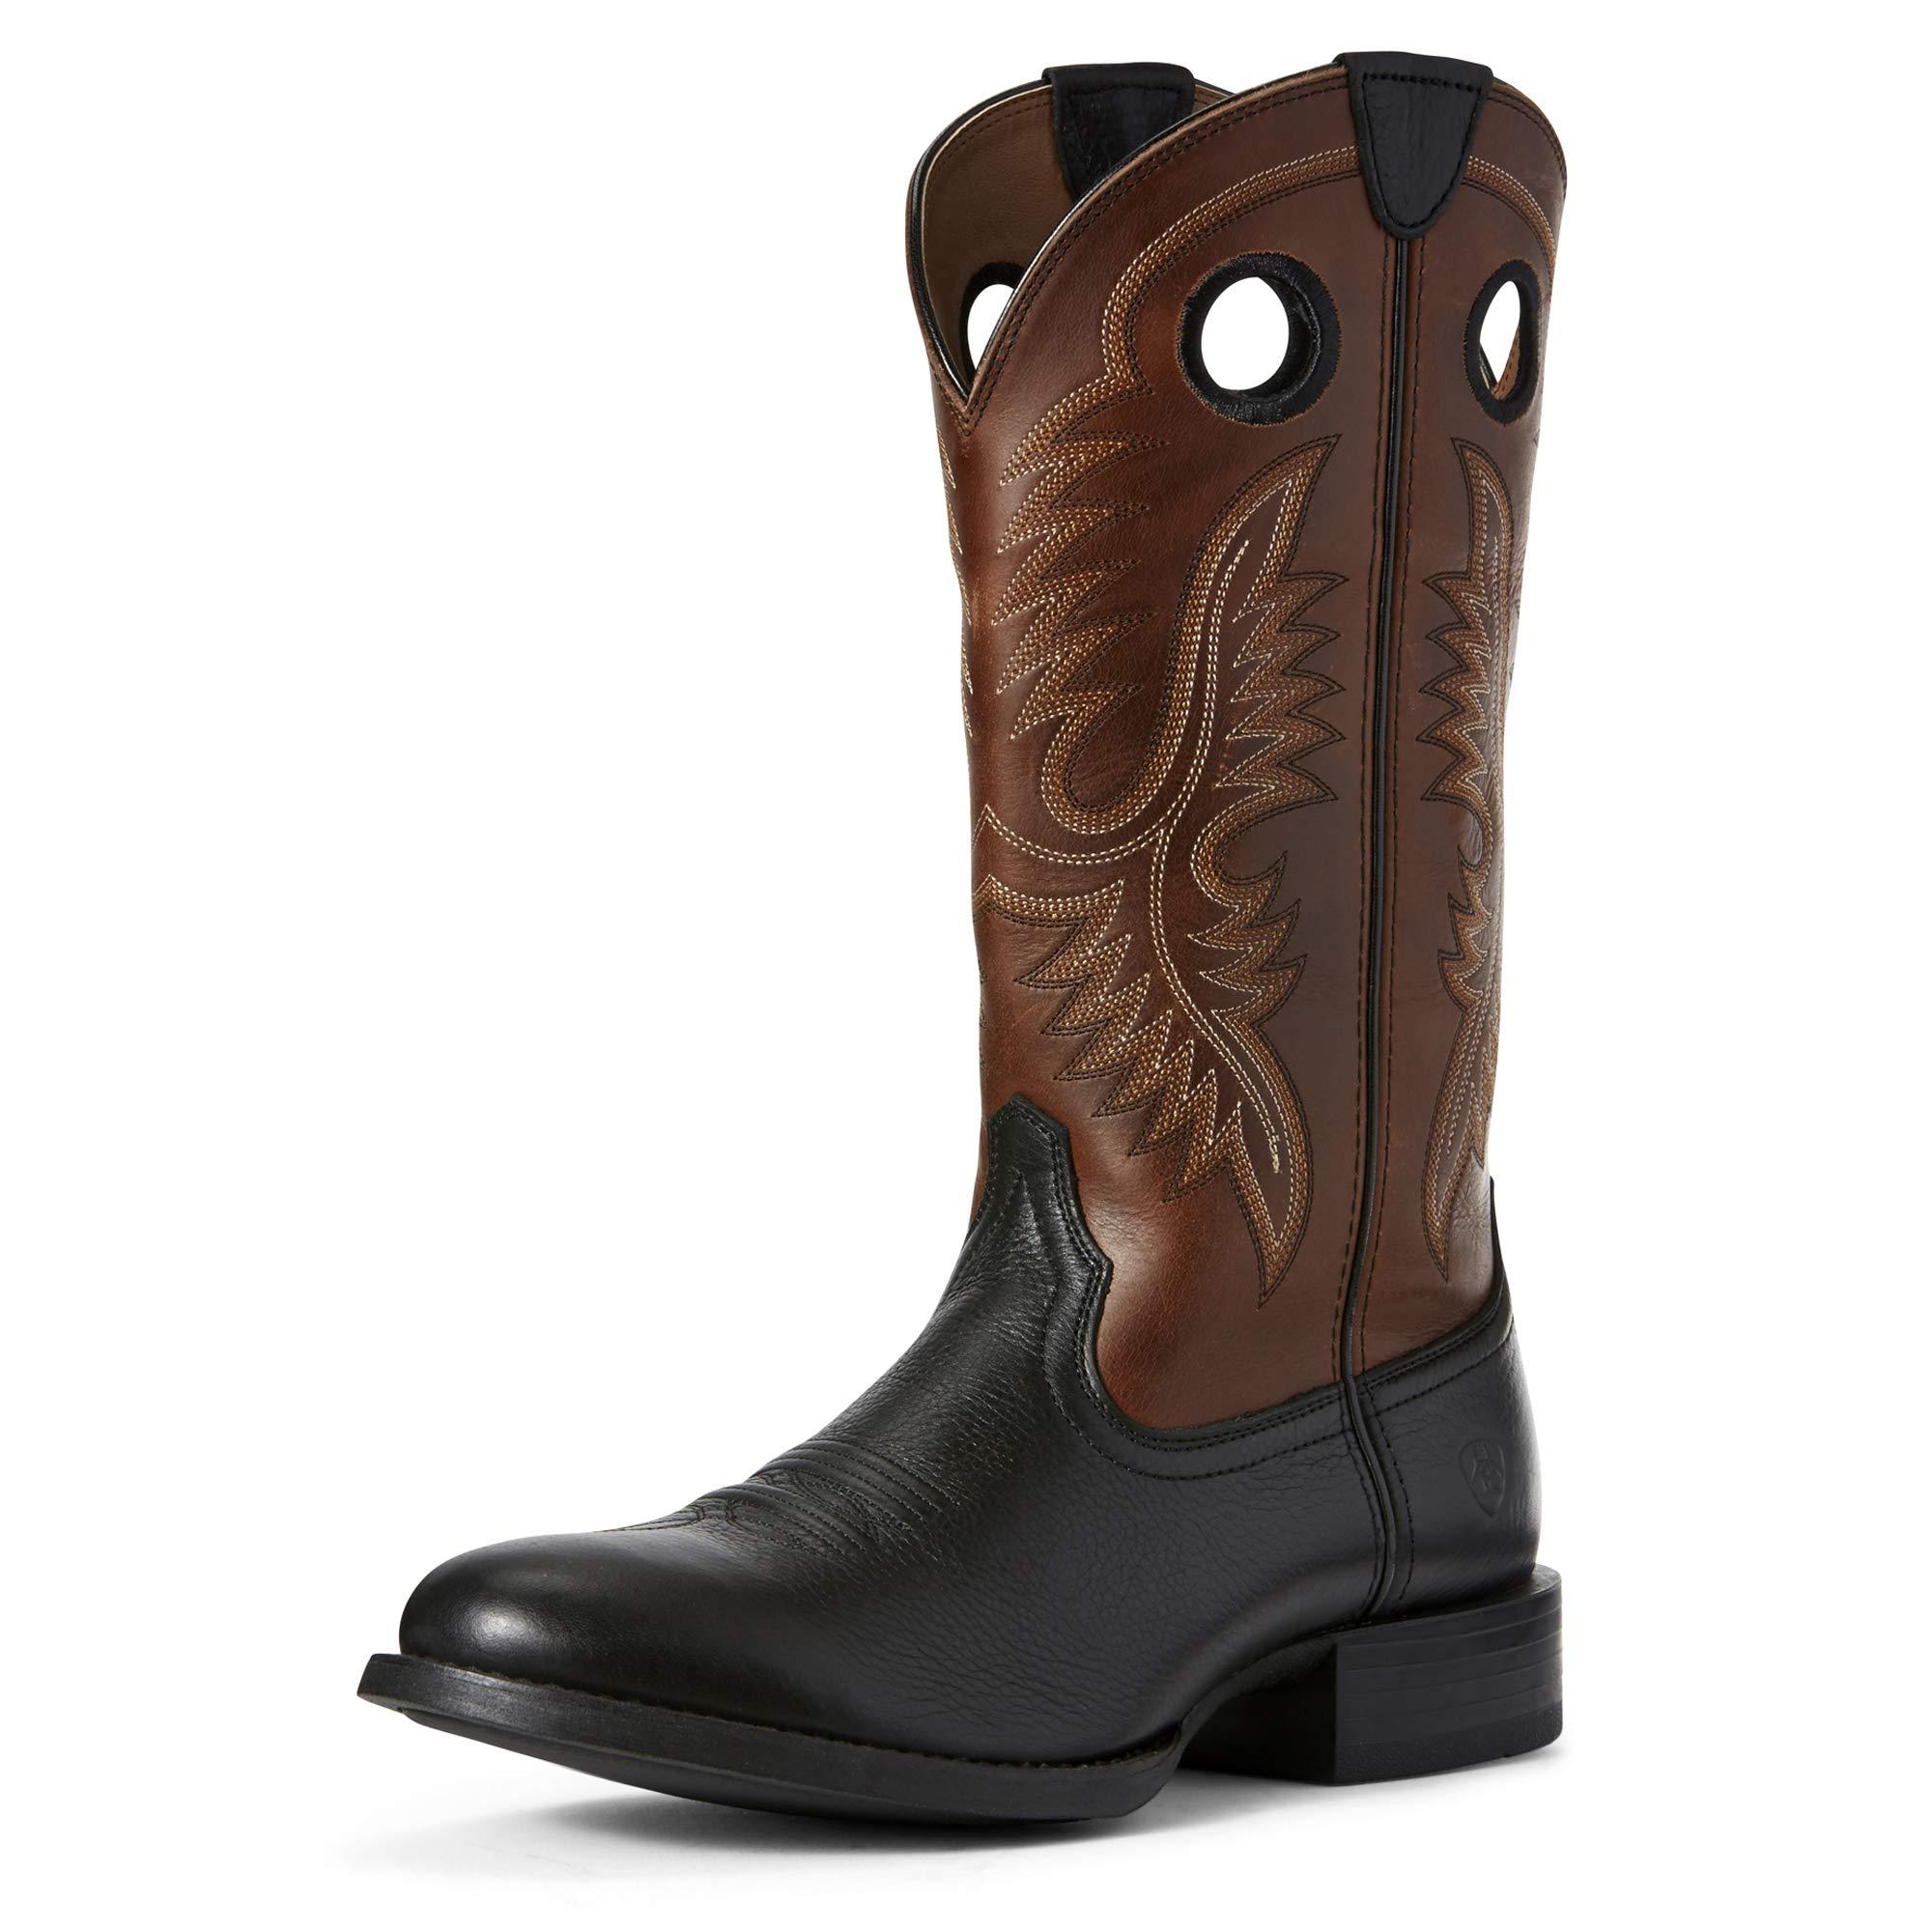 Ariat Men's Sport Big Hoss Western Boot, Black Carbon/Mayan Brown, 11EE by ARIAT